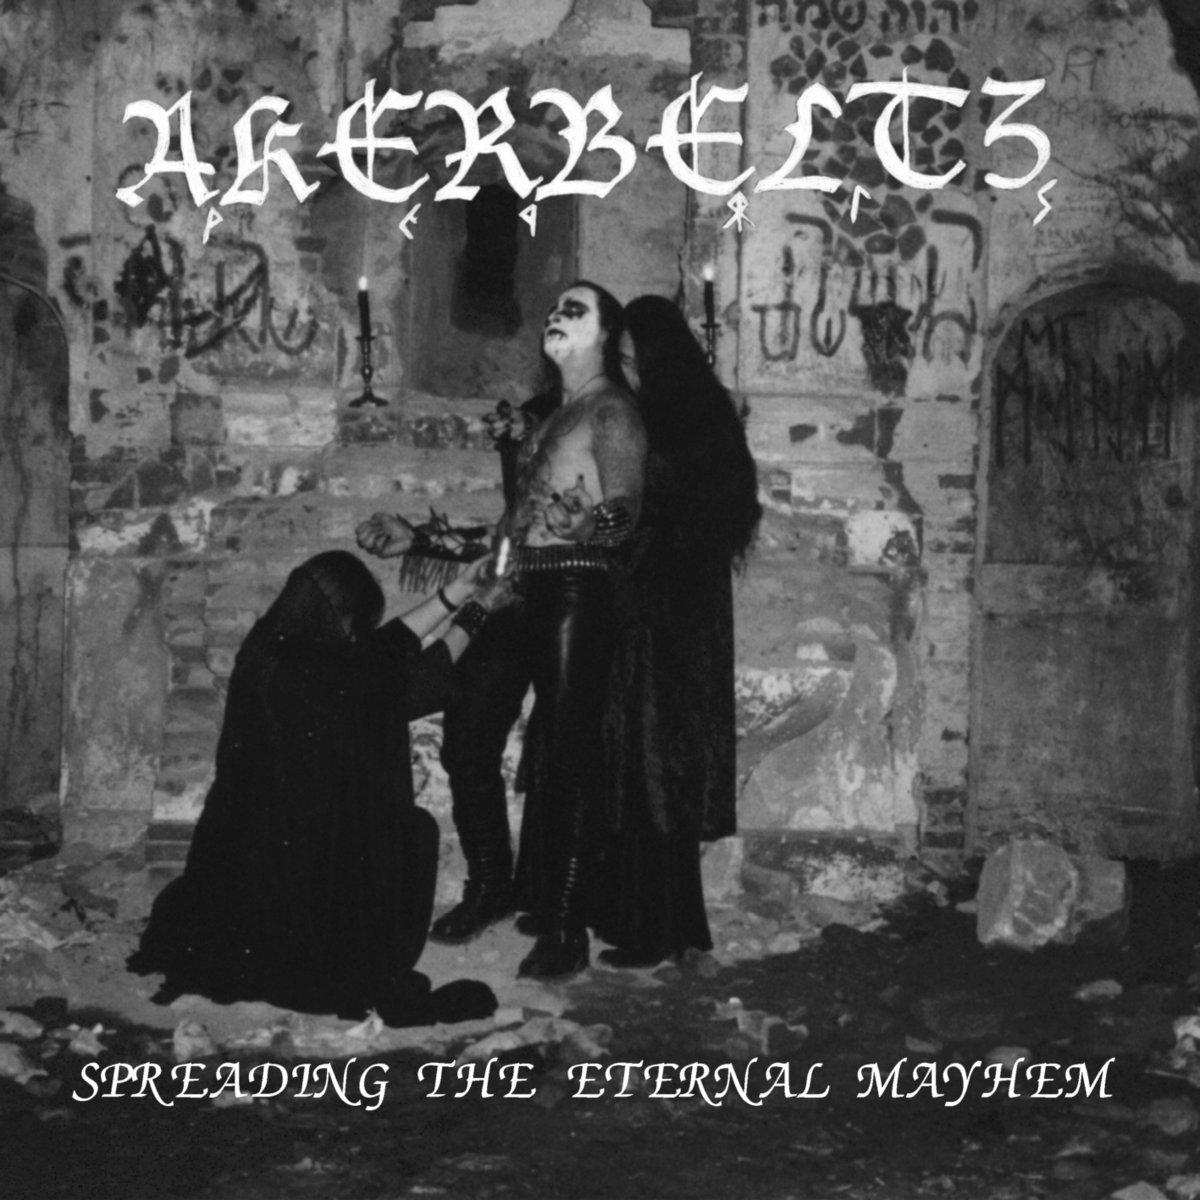 Akerbeltz - Spreading the Eternal Mayhem